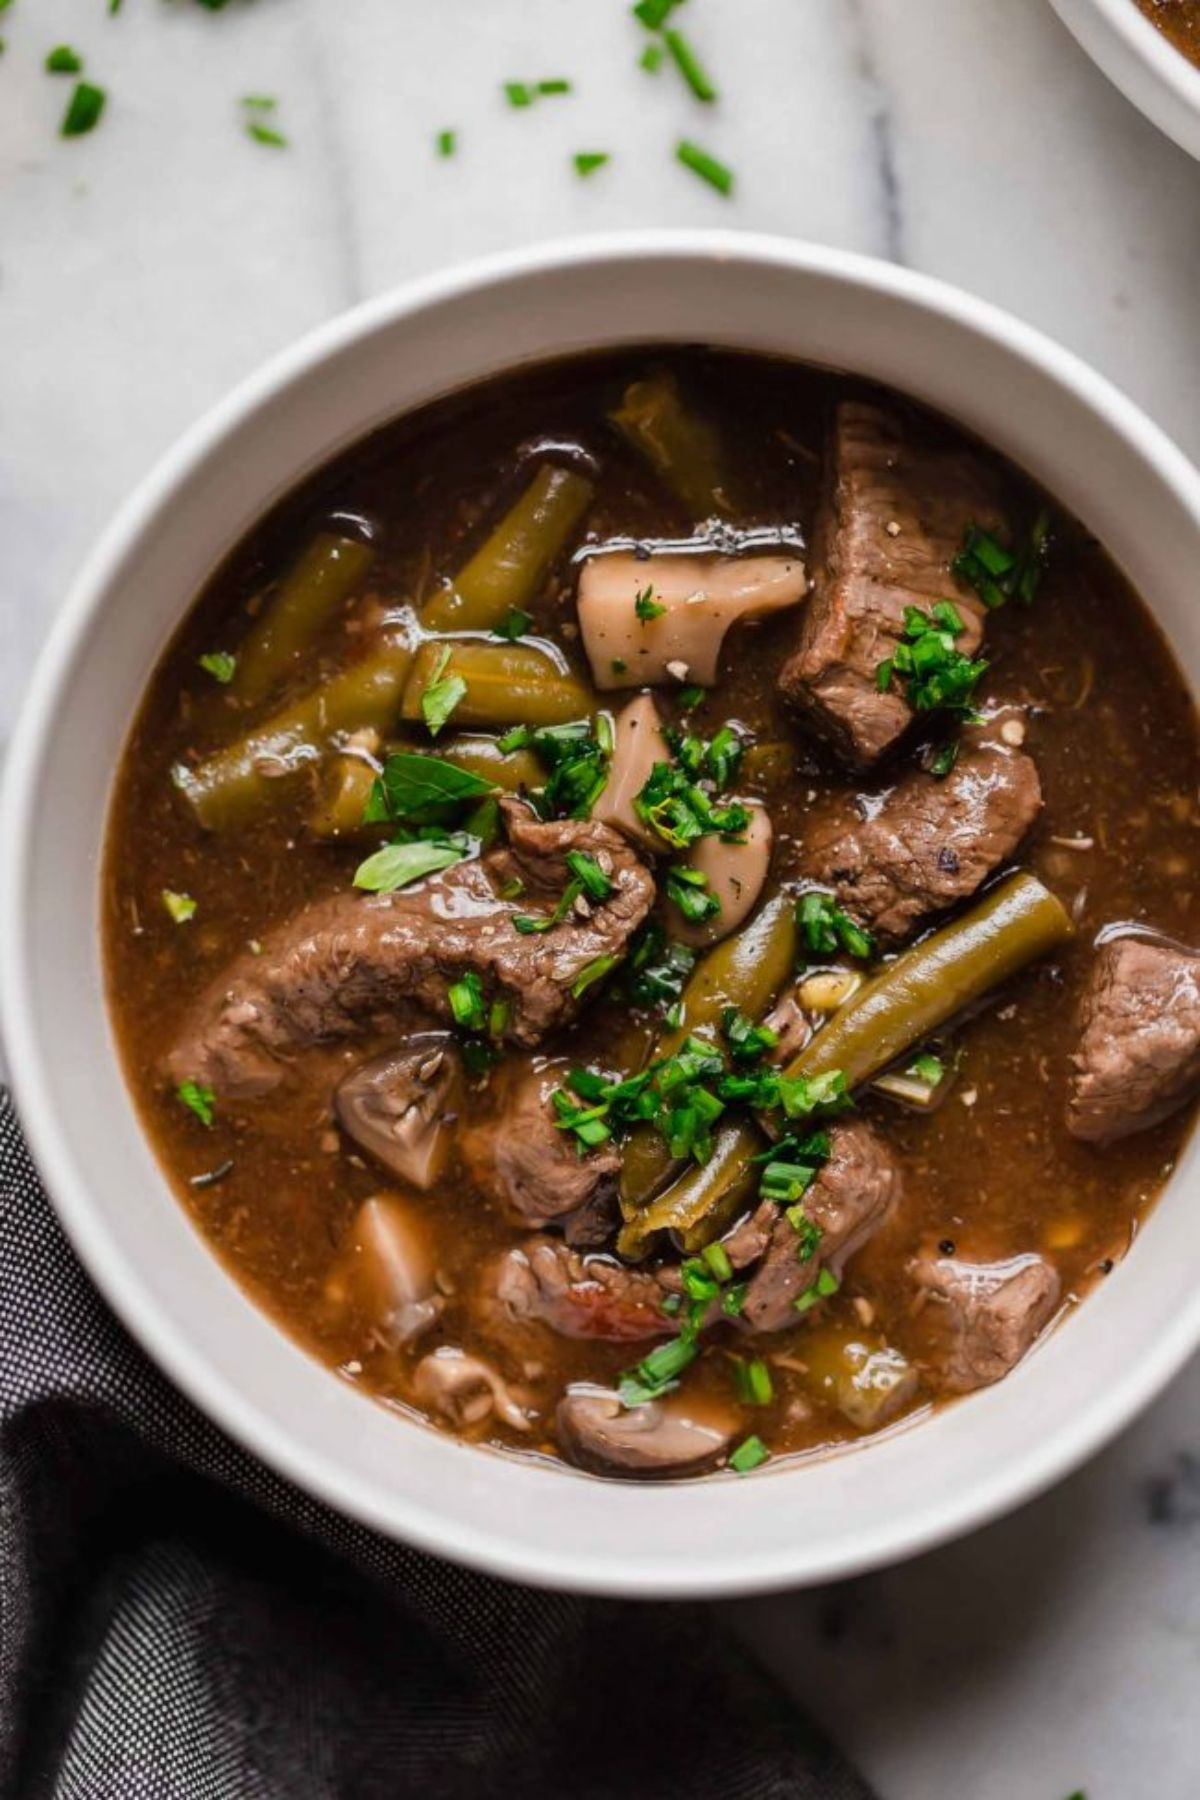 beef stew in a round white bowl